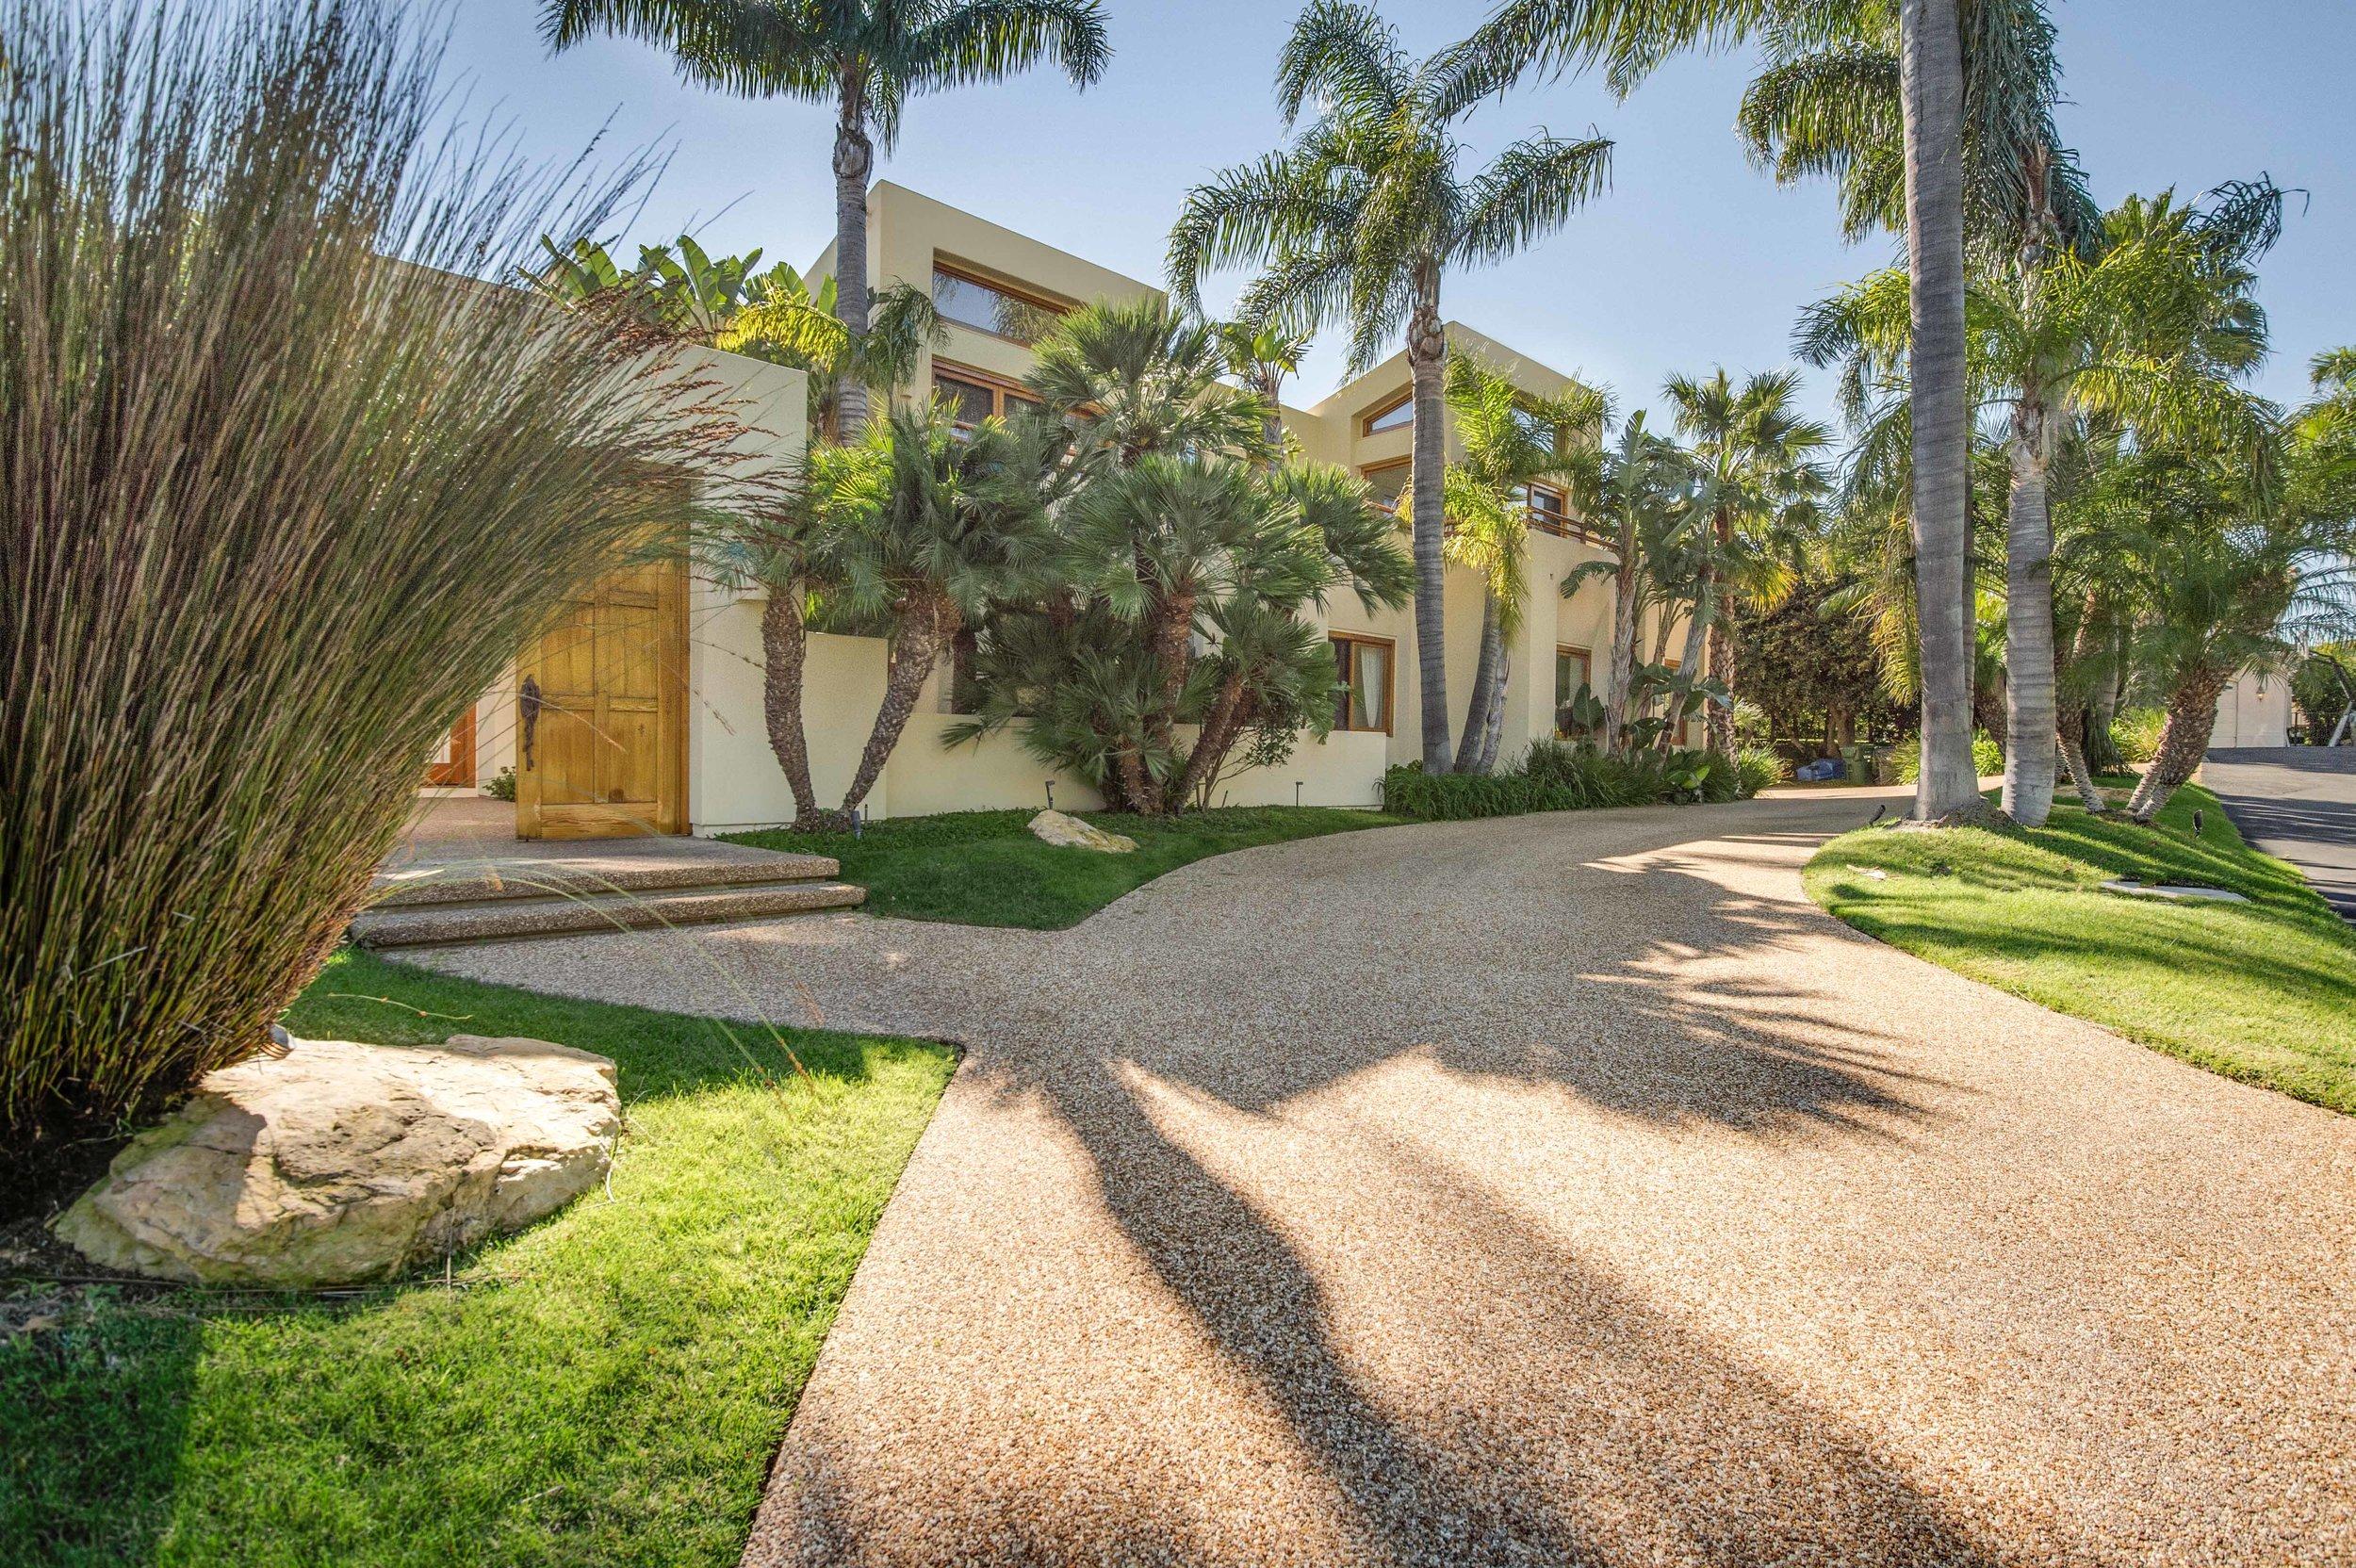 026 Front 27475 Latigo Bay View Drive For Sale Lease The Malibu Life Team Luxury Real Estate.jpg